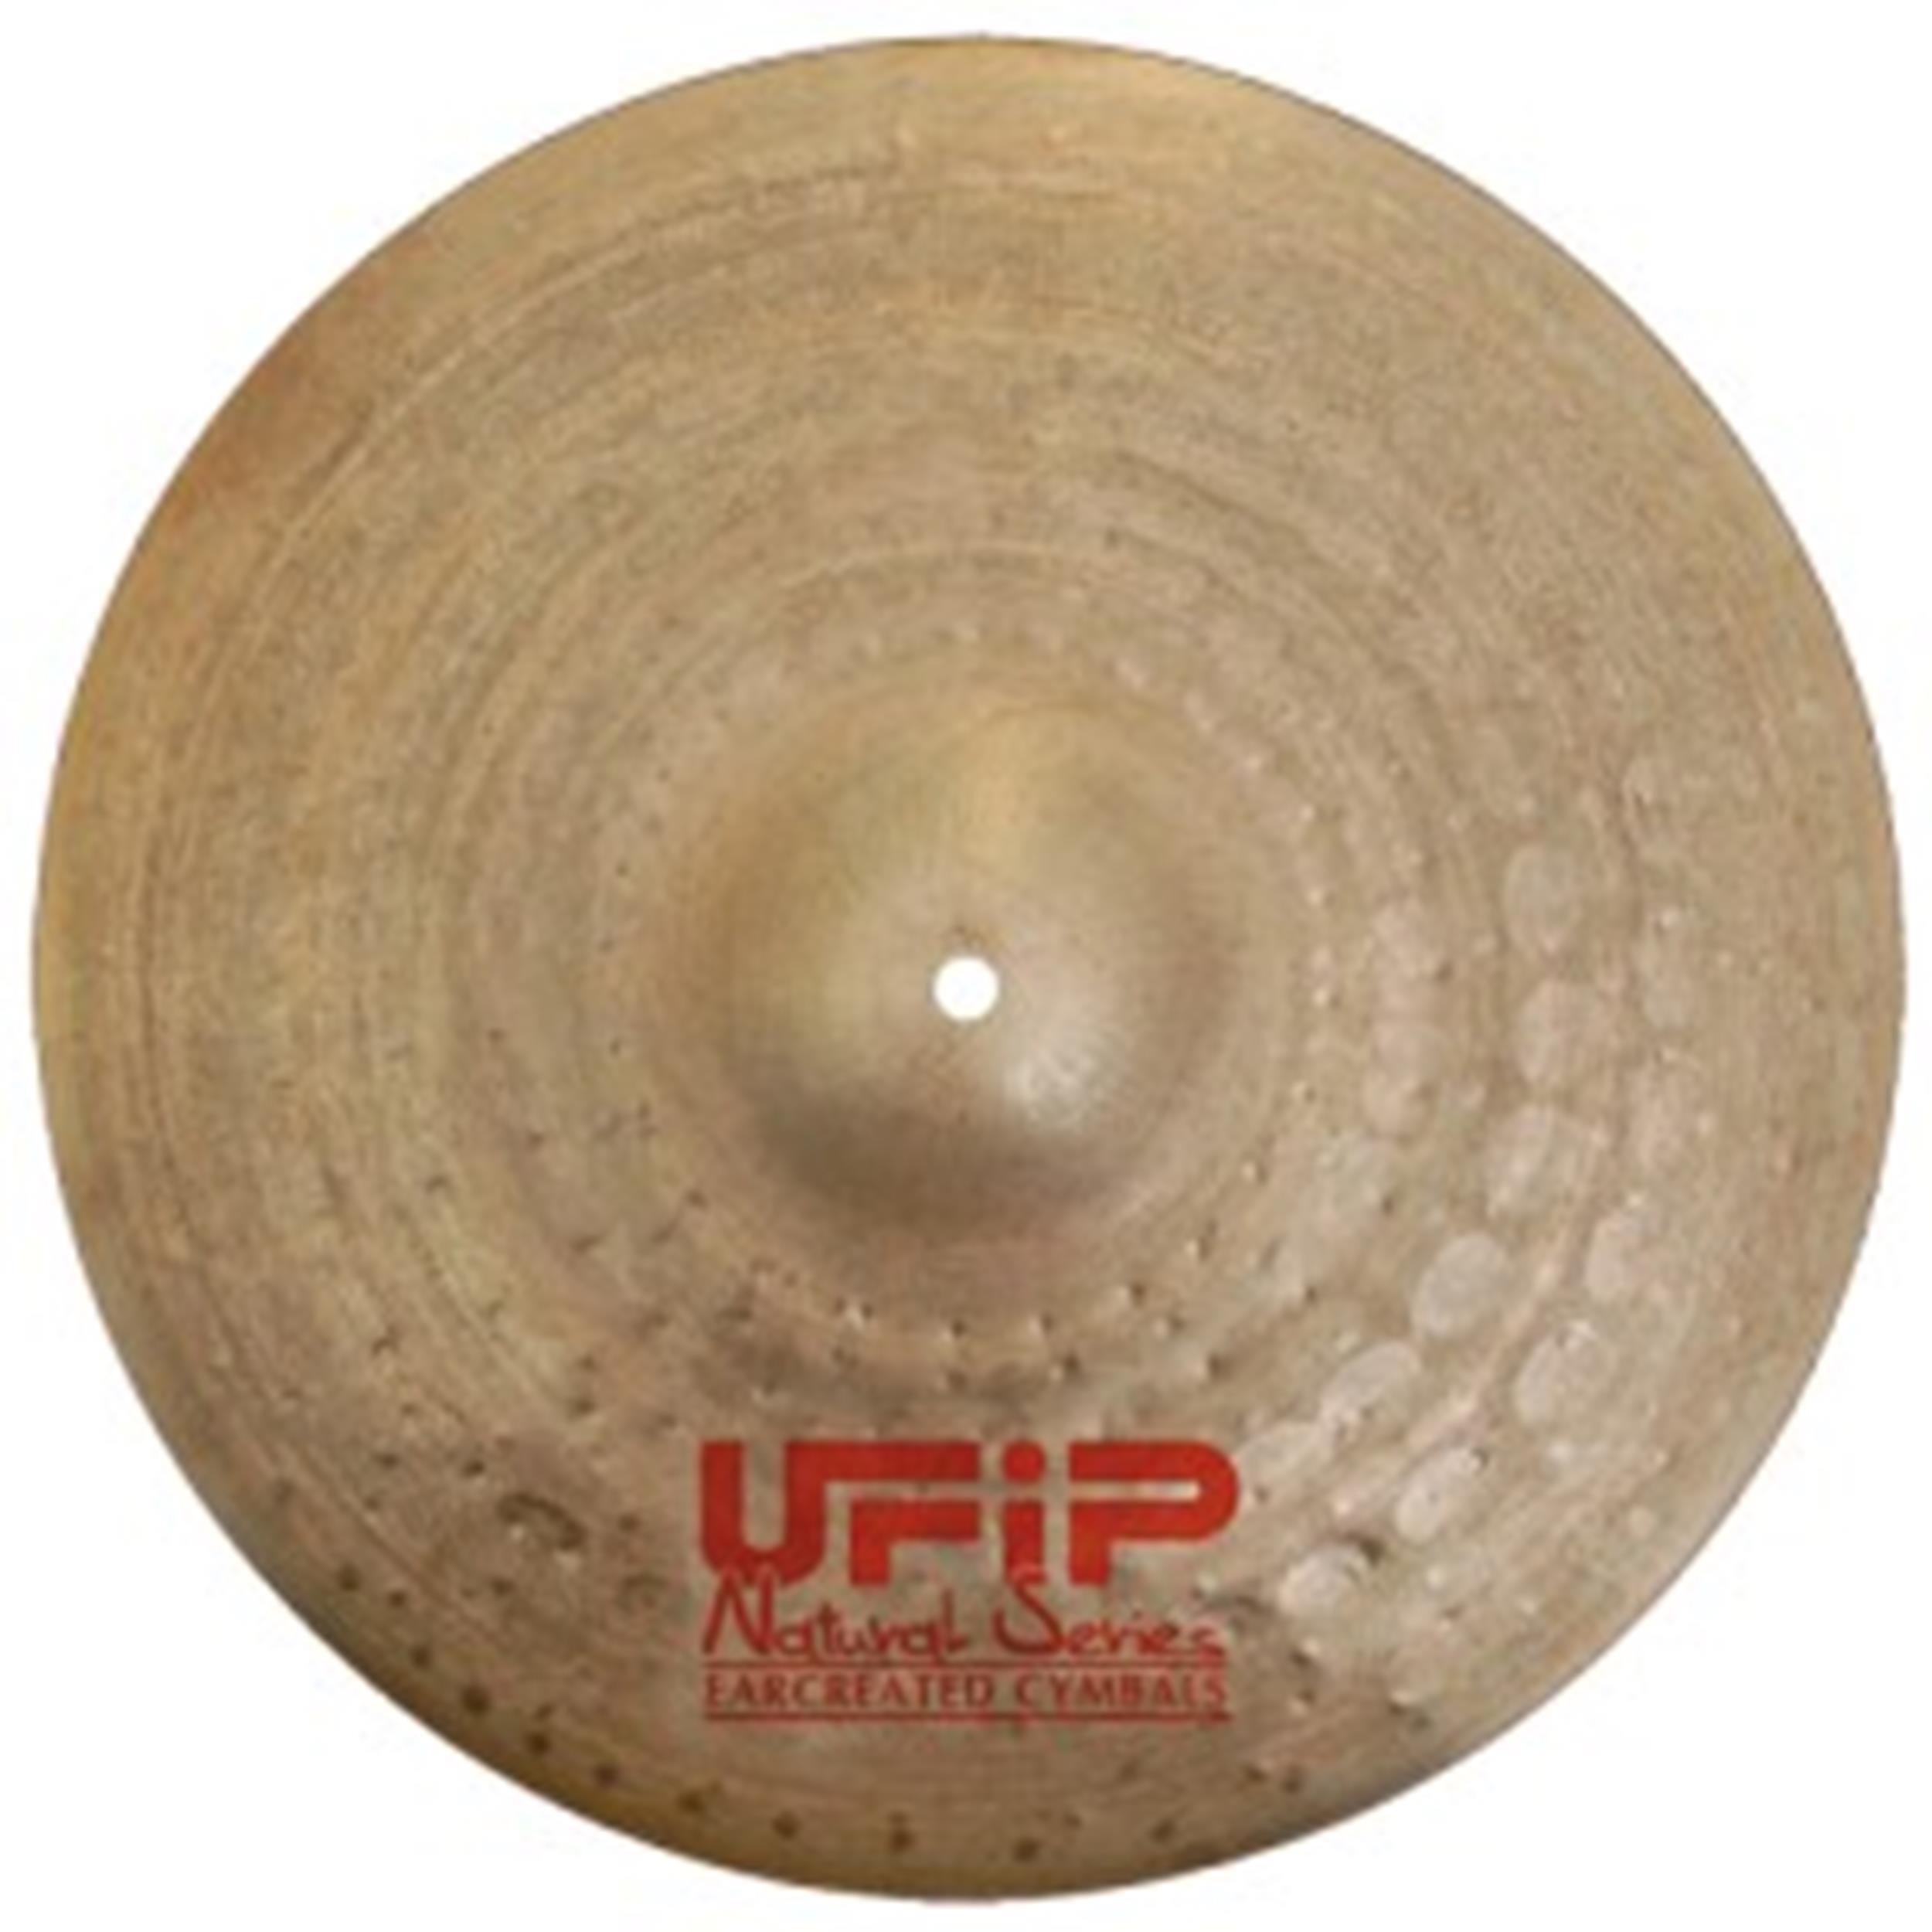 UFIP-NS-22RV-Natural-Series-22-Ride-Sizzle-sku-45600152